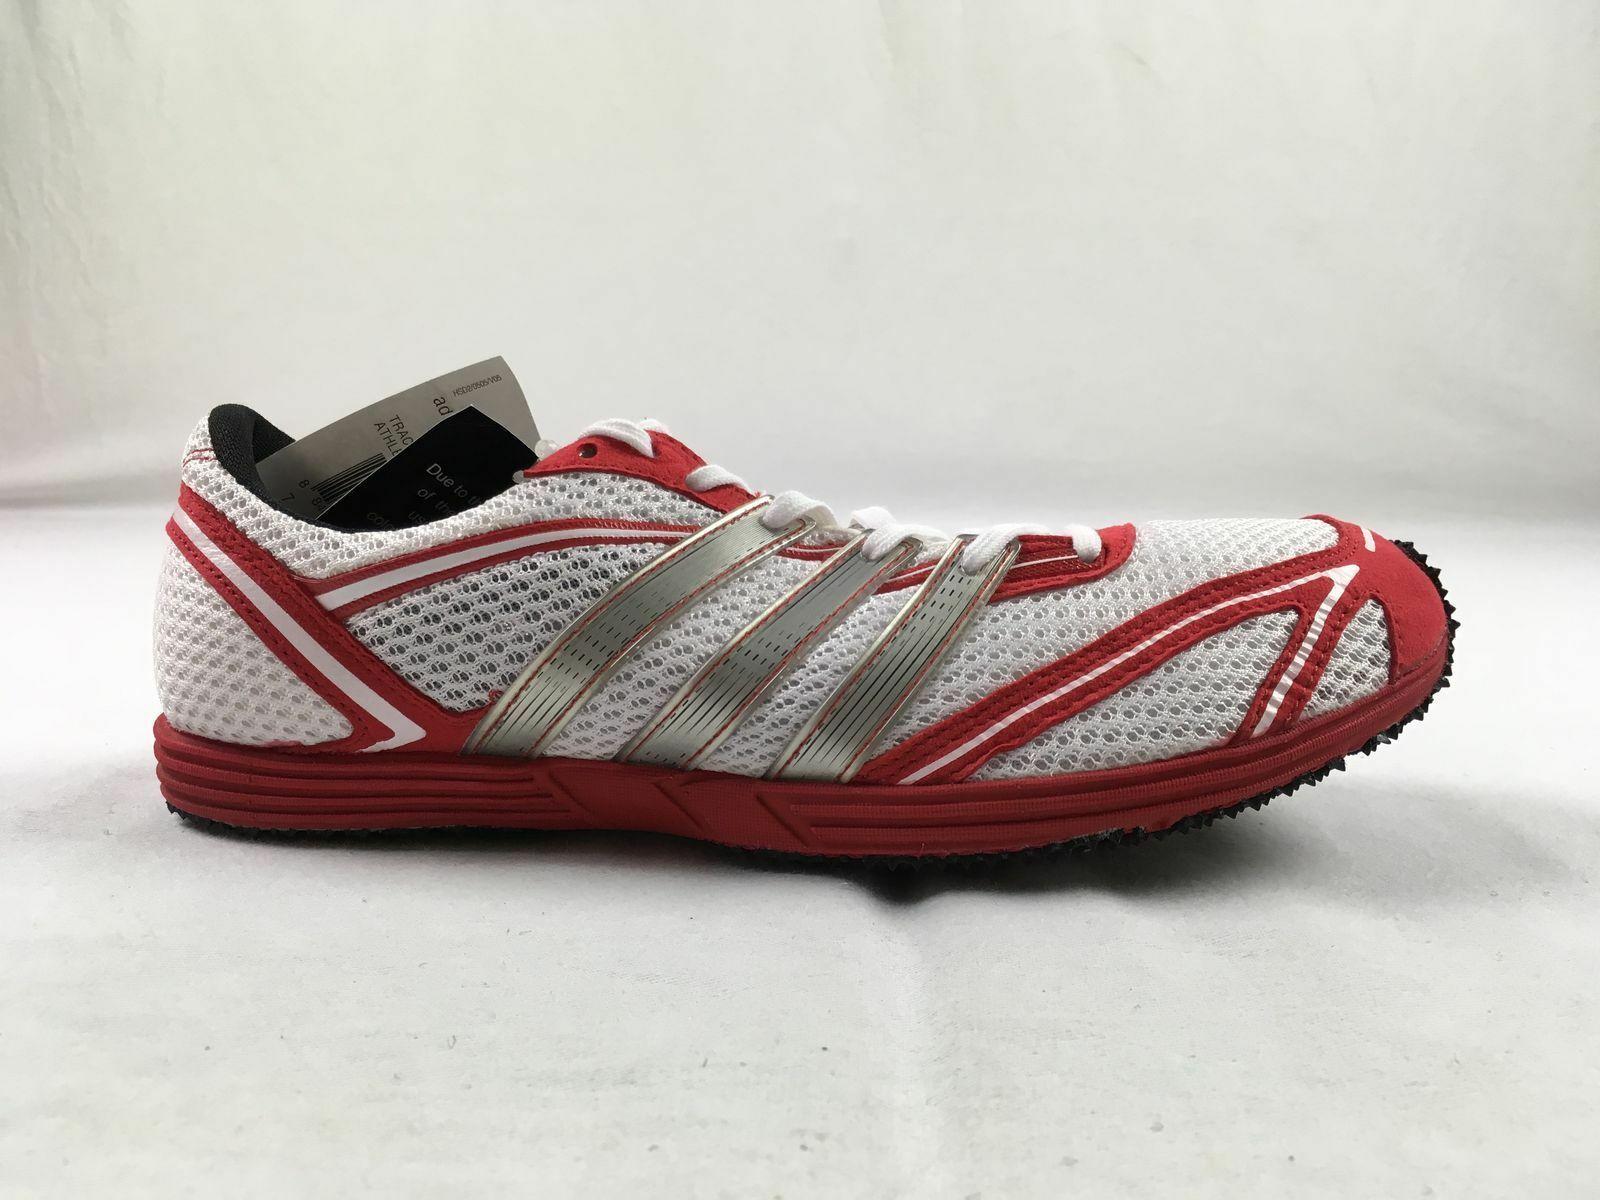 New adidas adizero cadence red cleats mens 75 20